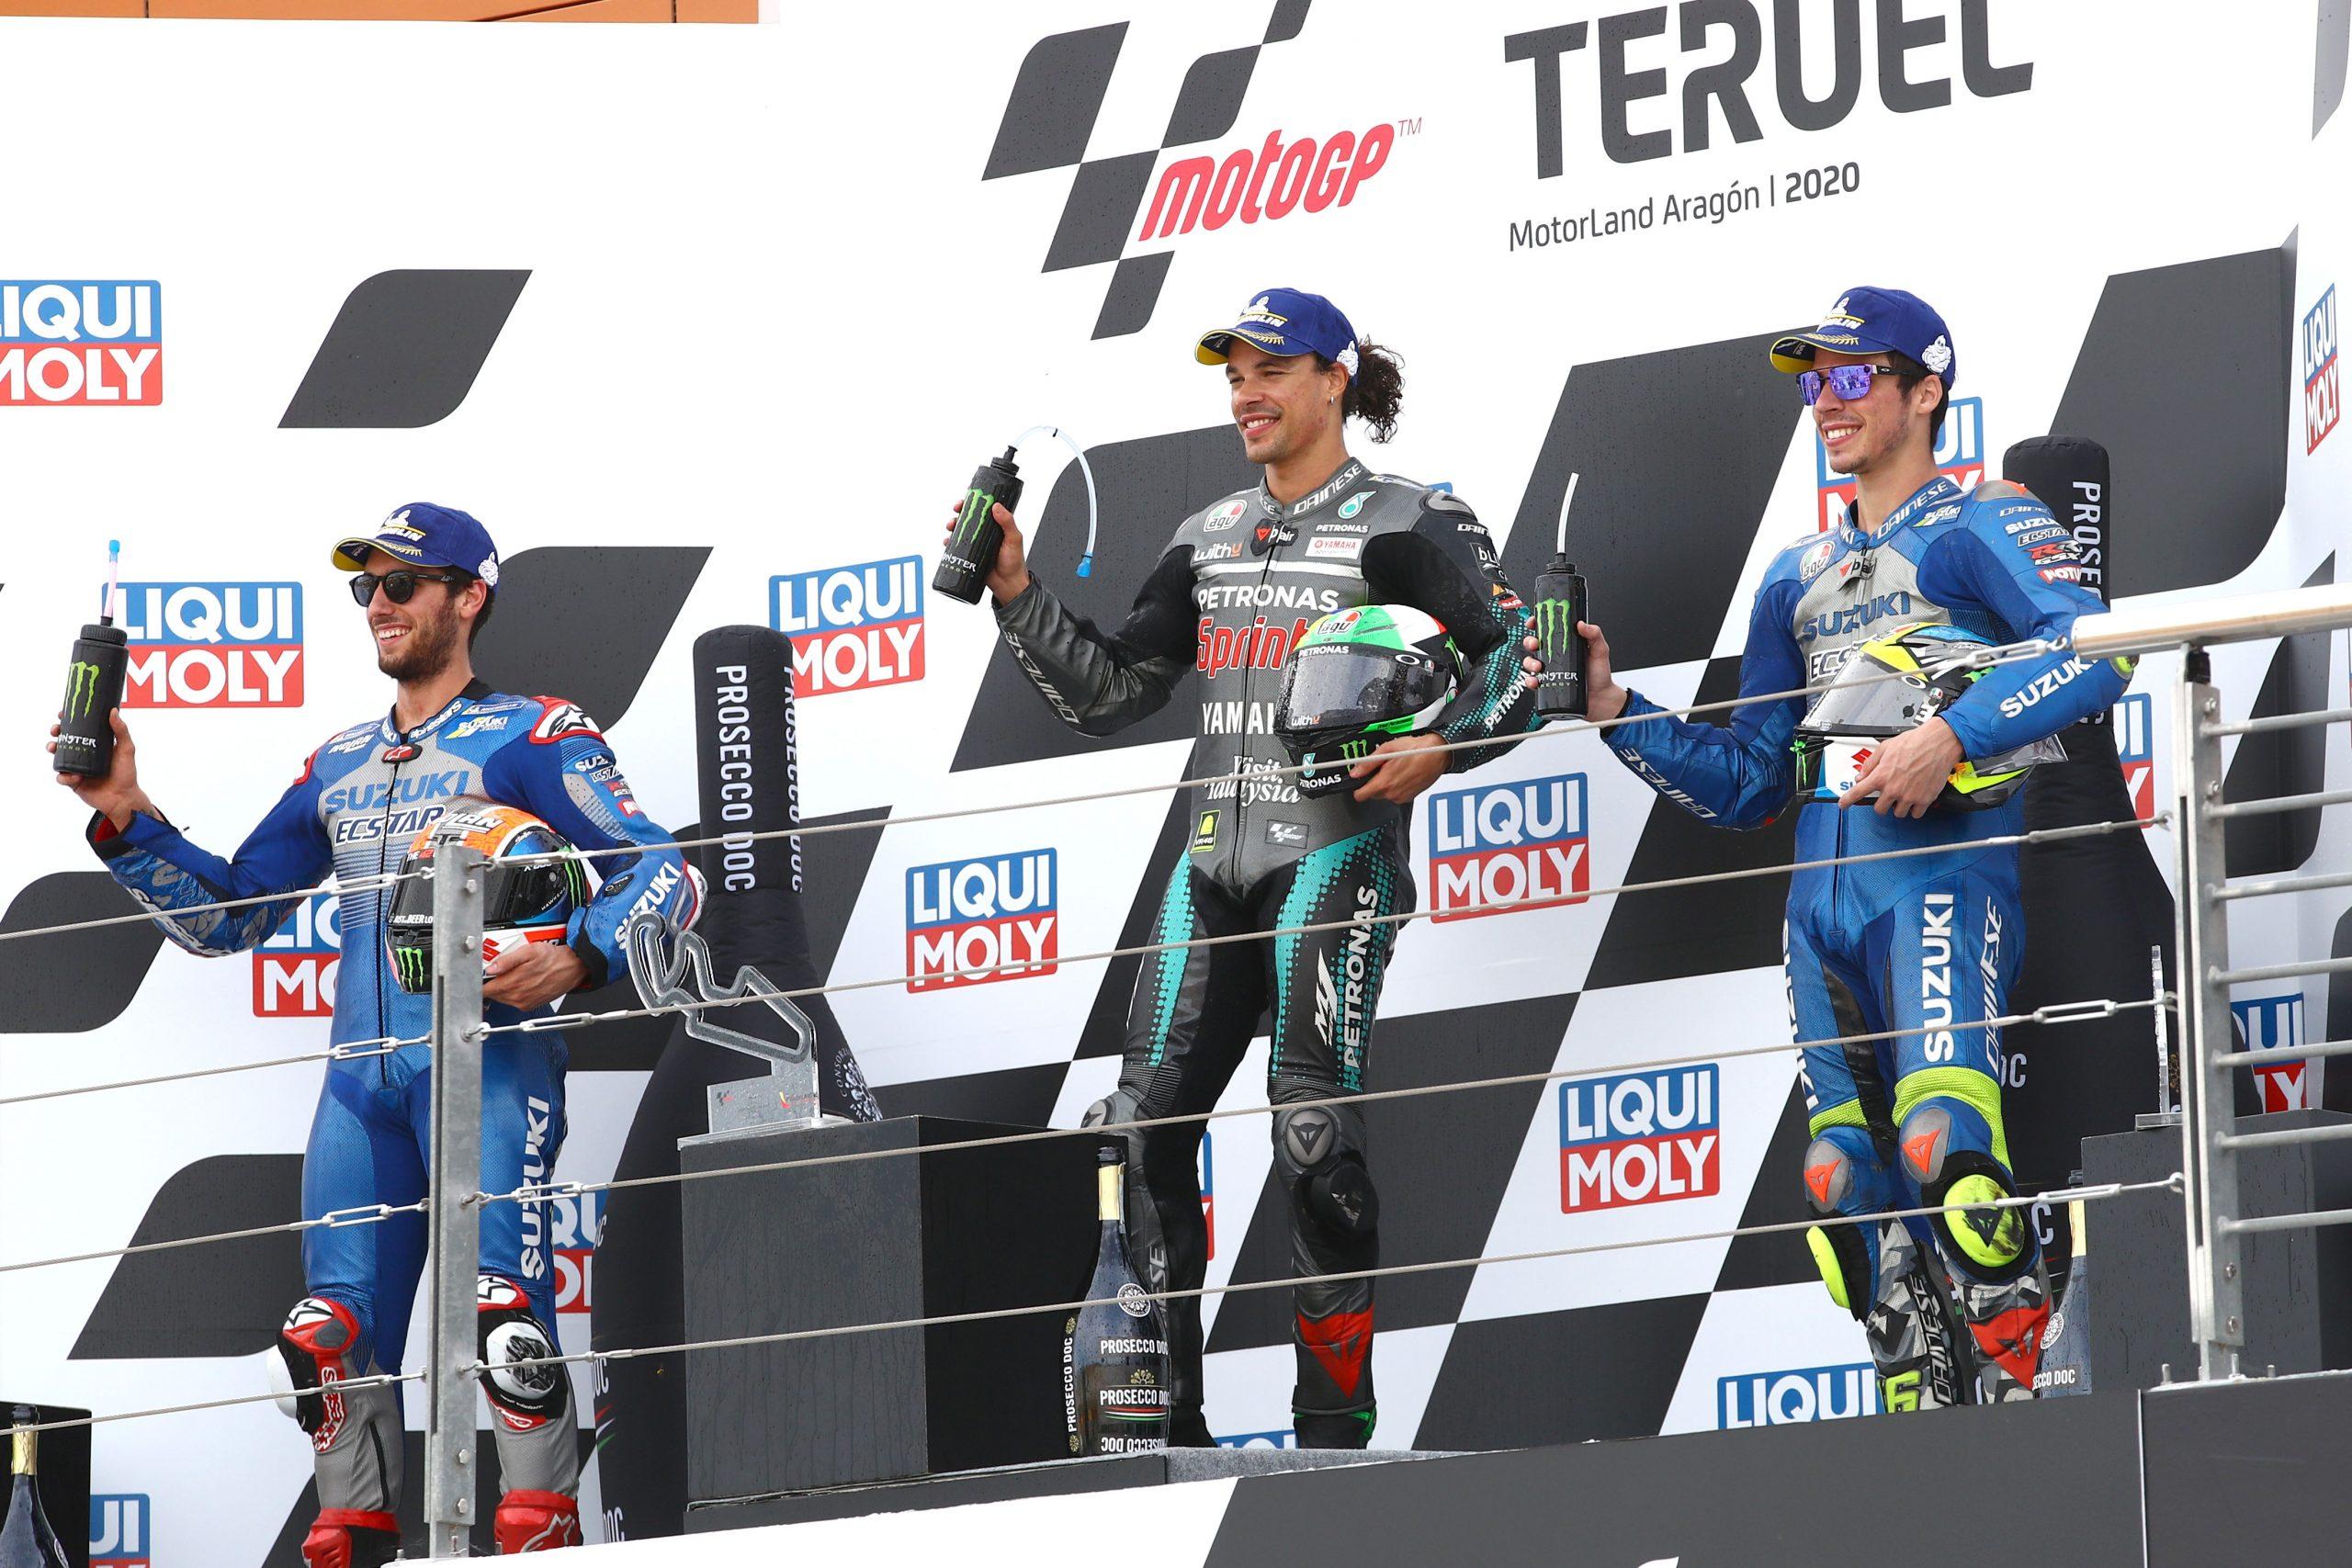 Alex Rins Franco Morbideli Joan Mir , MotoGP race. Teruel MotoGP. 25 October 202